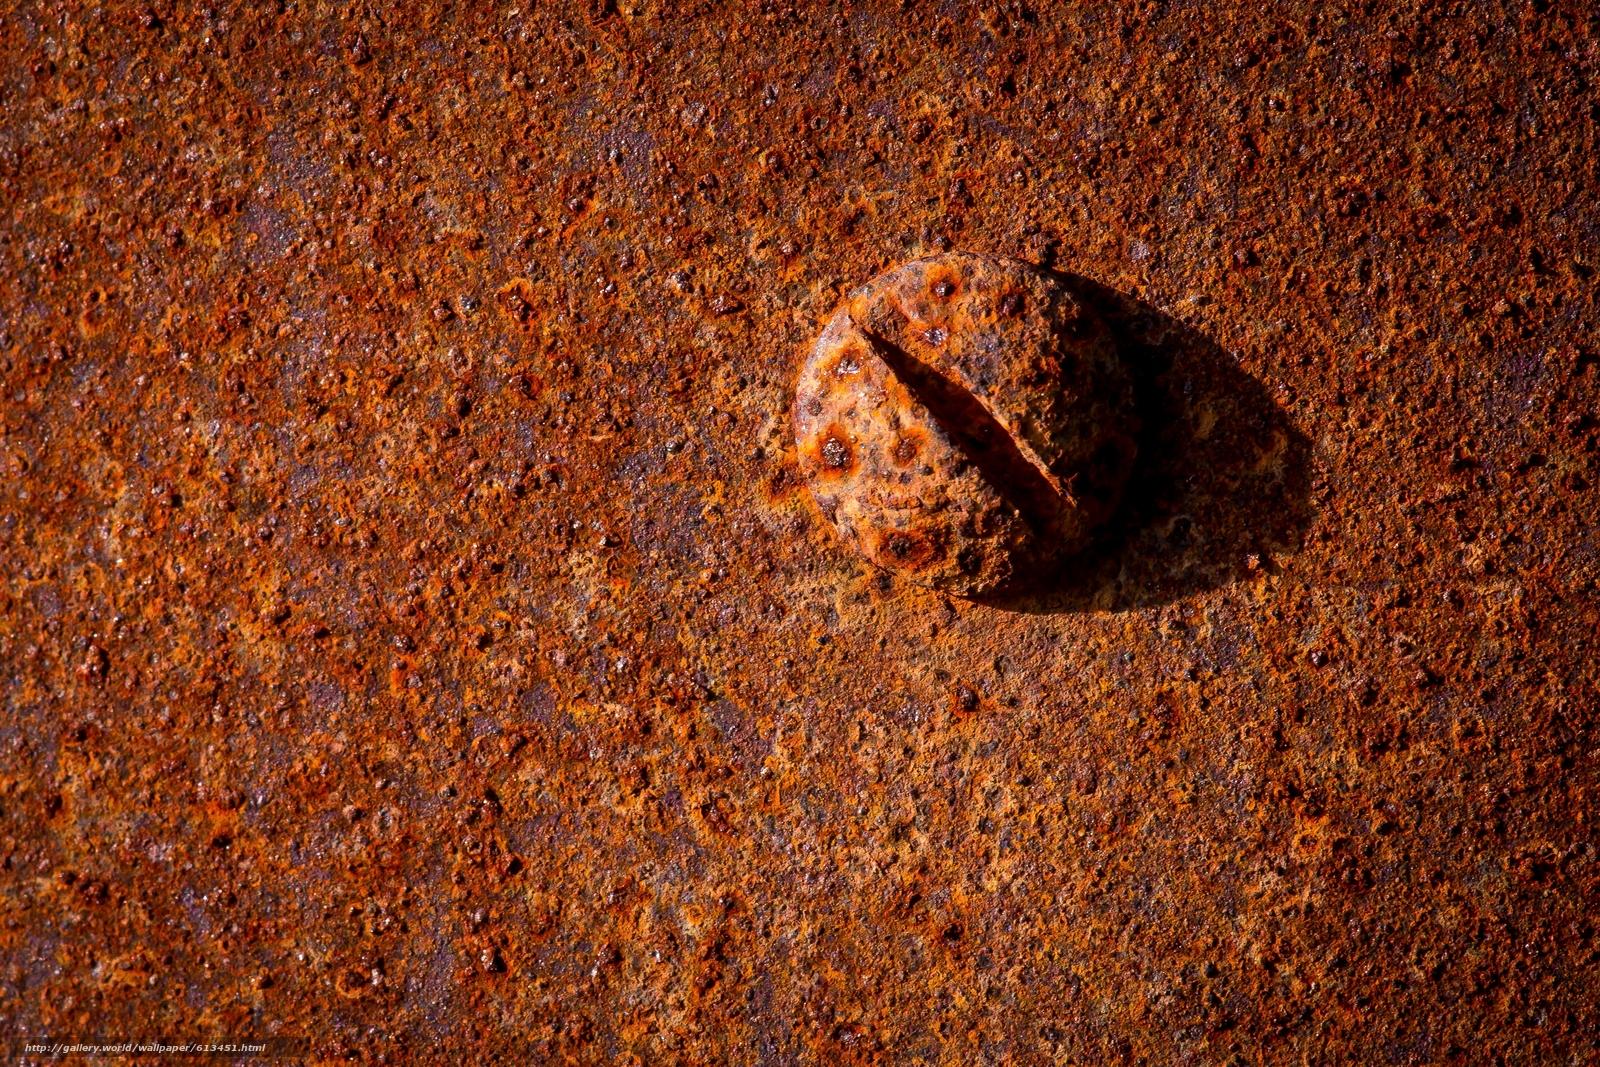 Download wallpaper Bolt,  rust,  metal,  Macro free desktop wallpaper in the resolution 3600x2400 — picture №613451